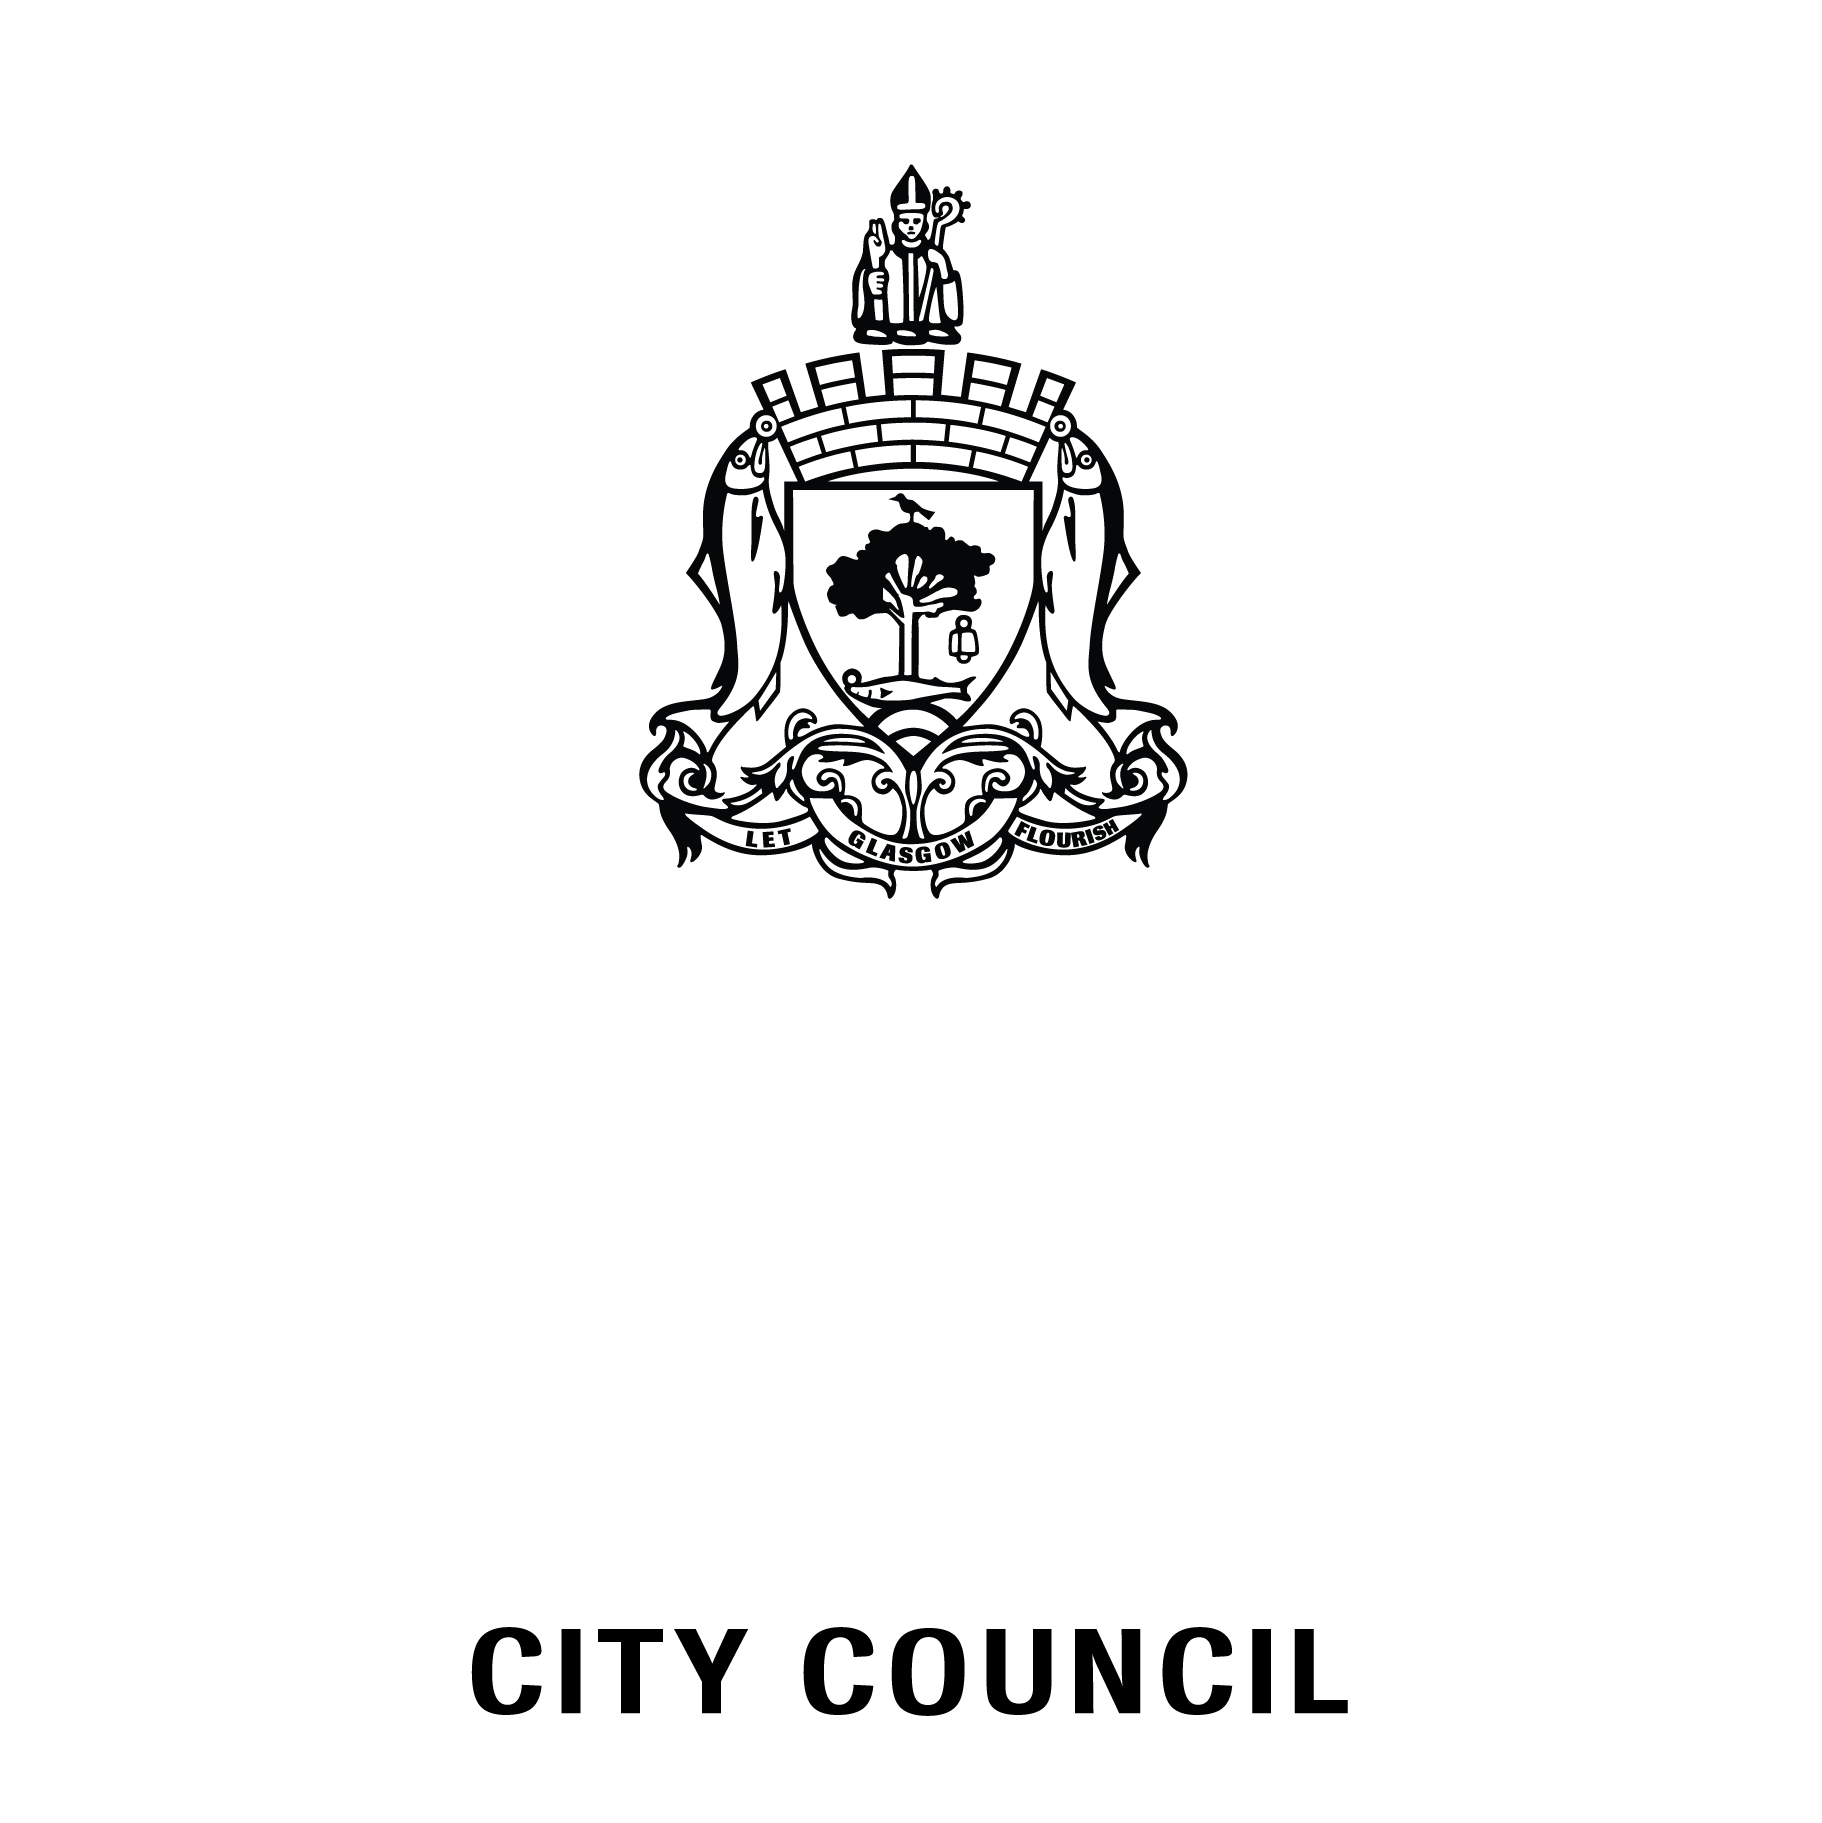 glasgow-city-council-logo